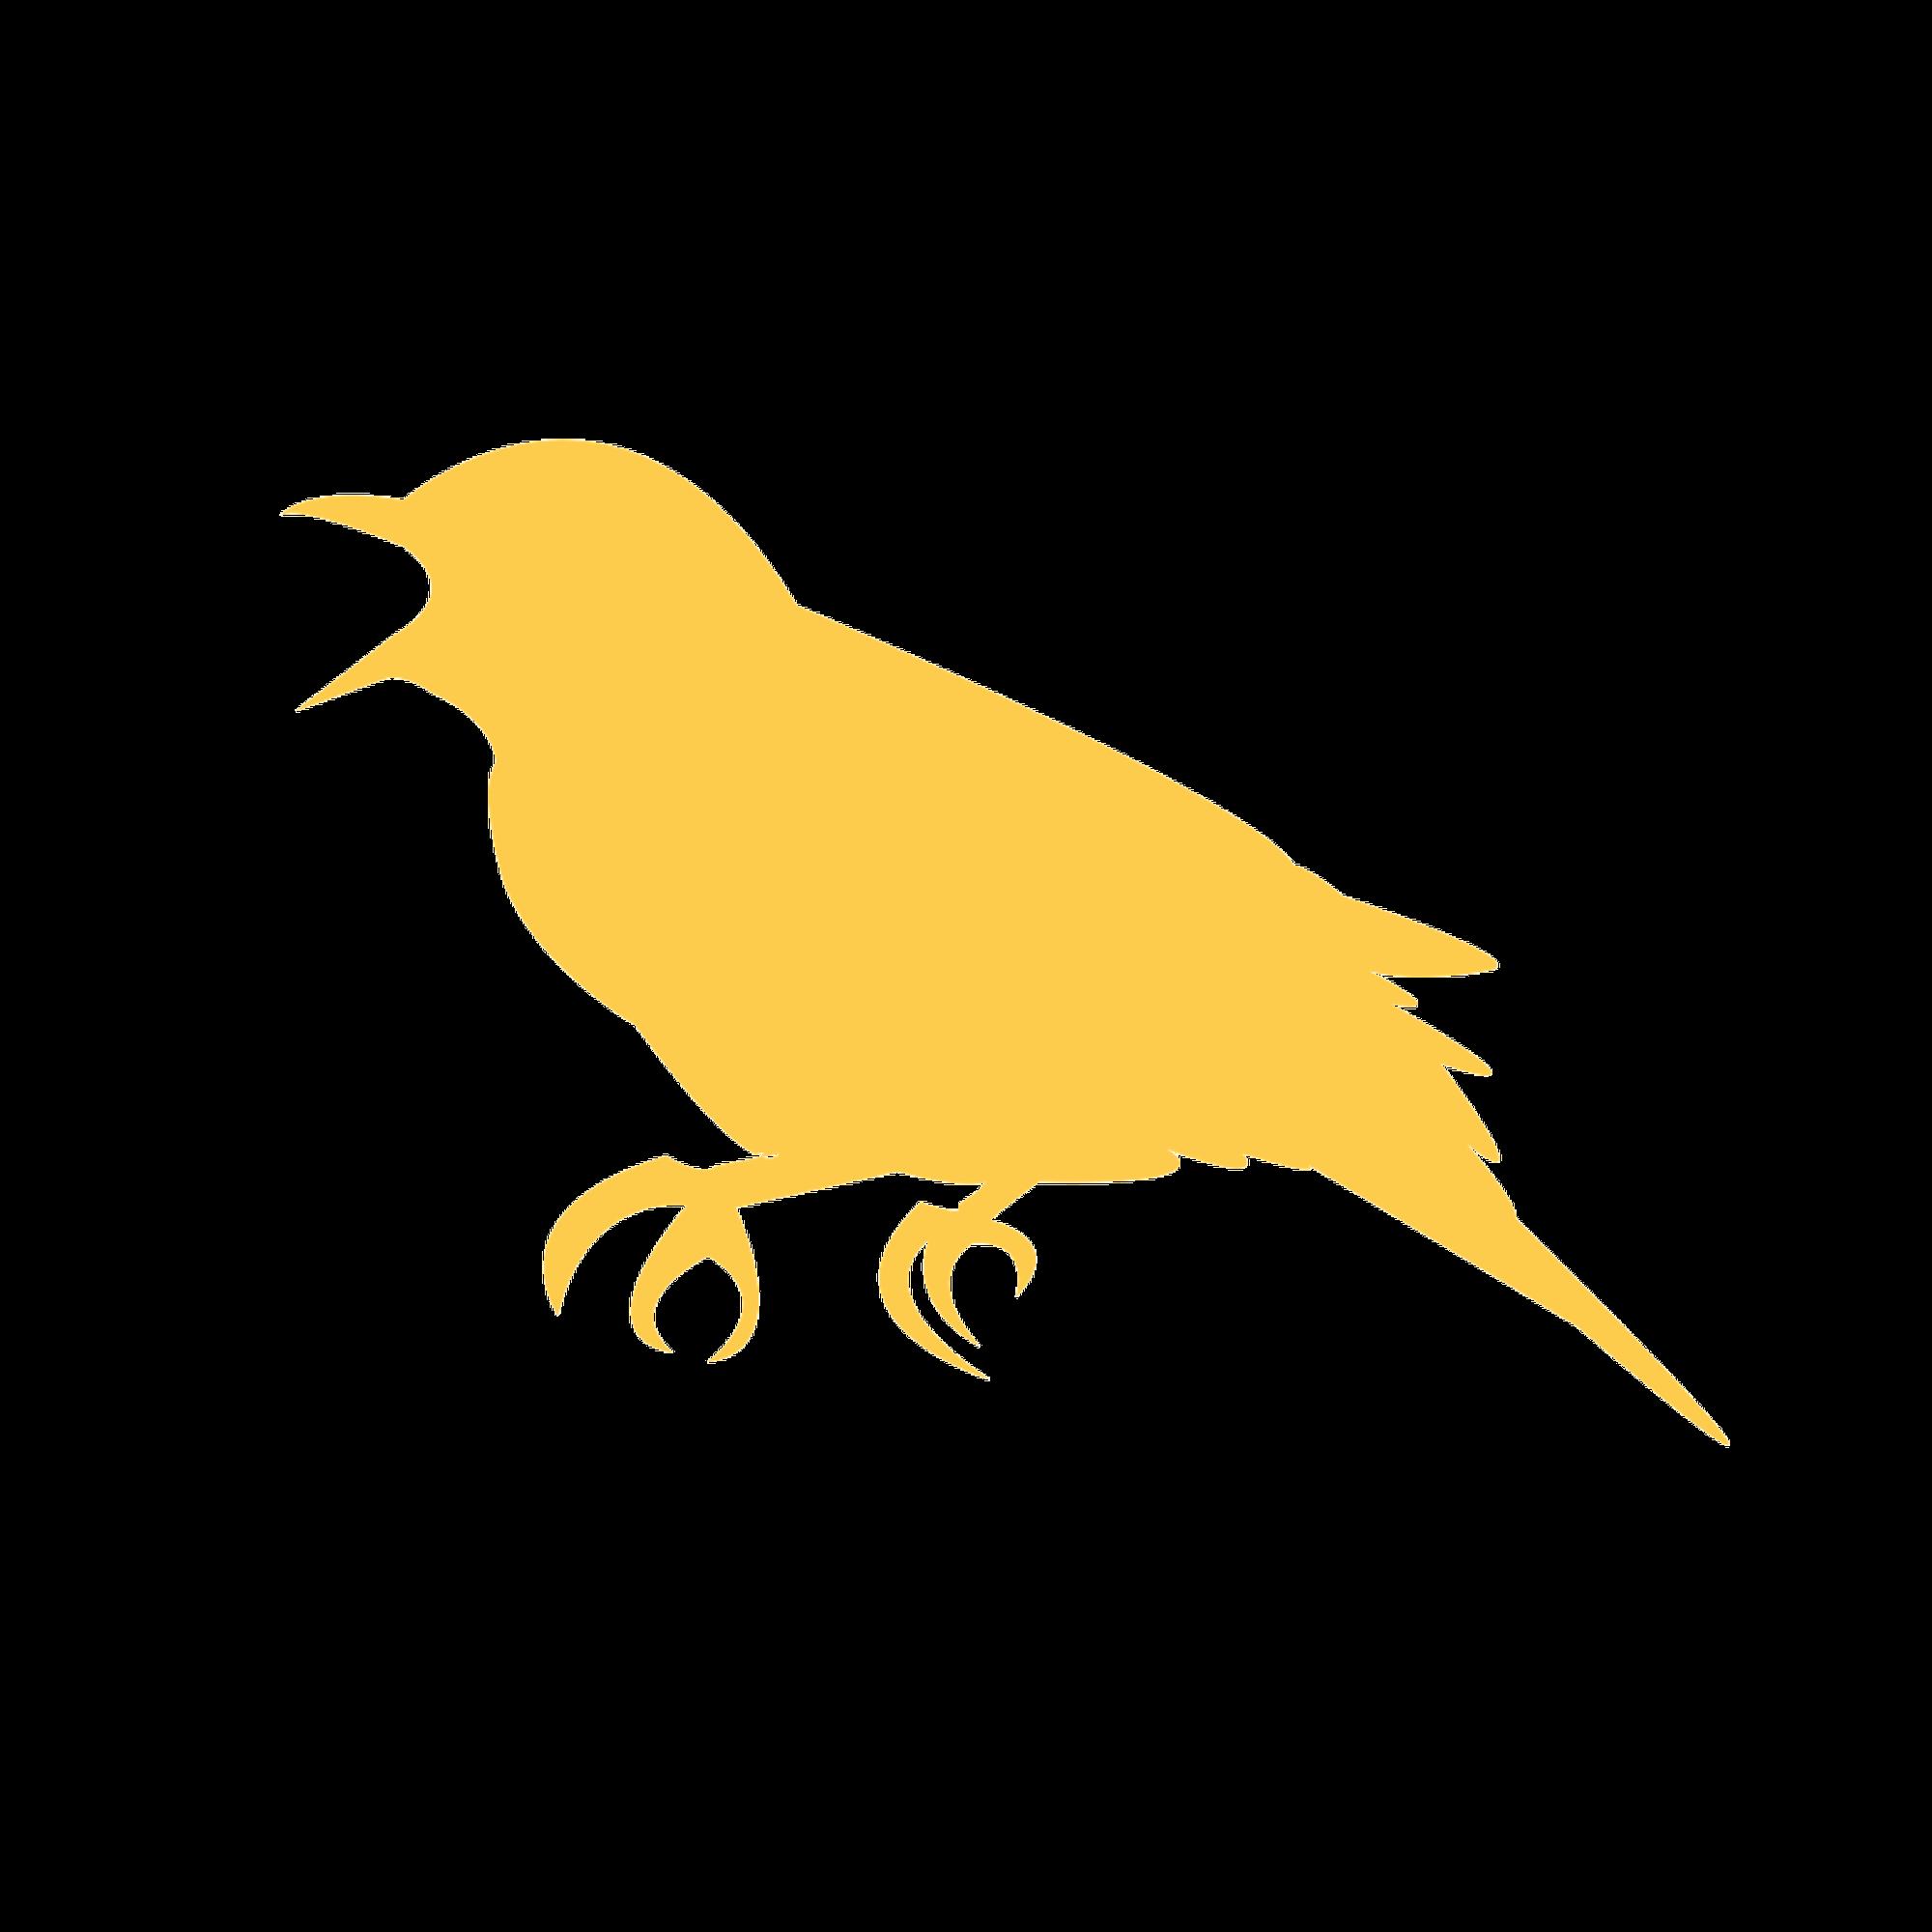 Sweet Songbird - 12 monthsBest Value